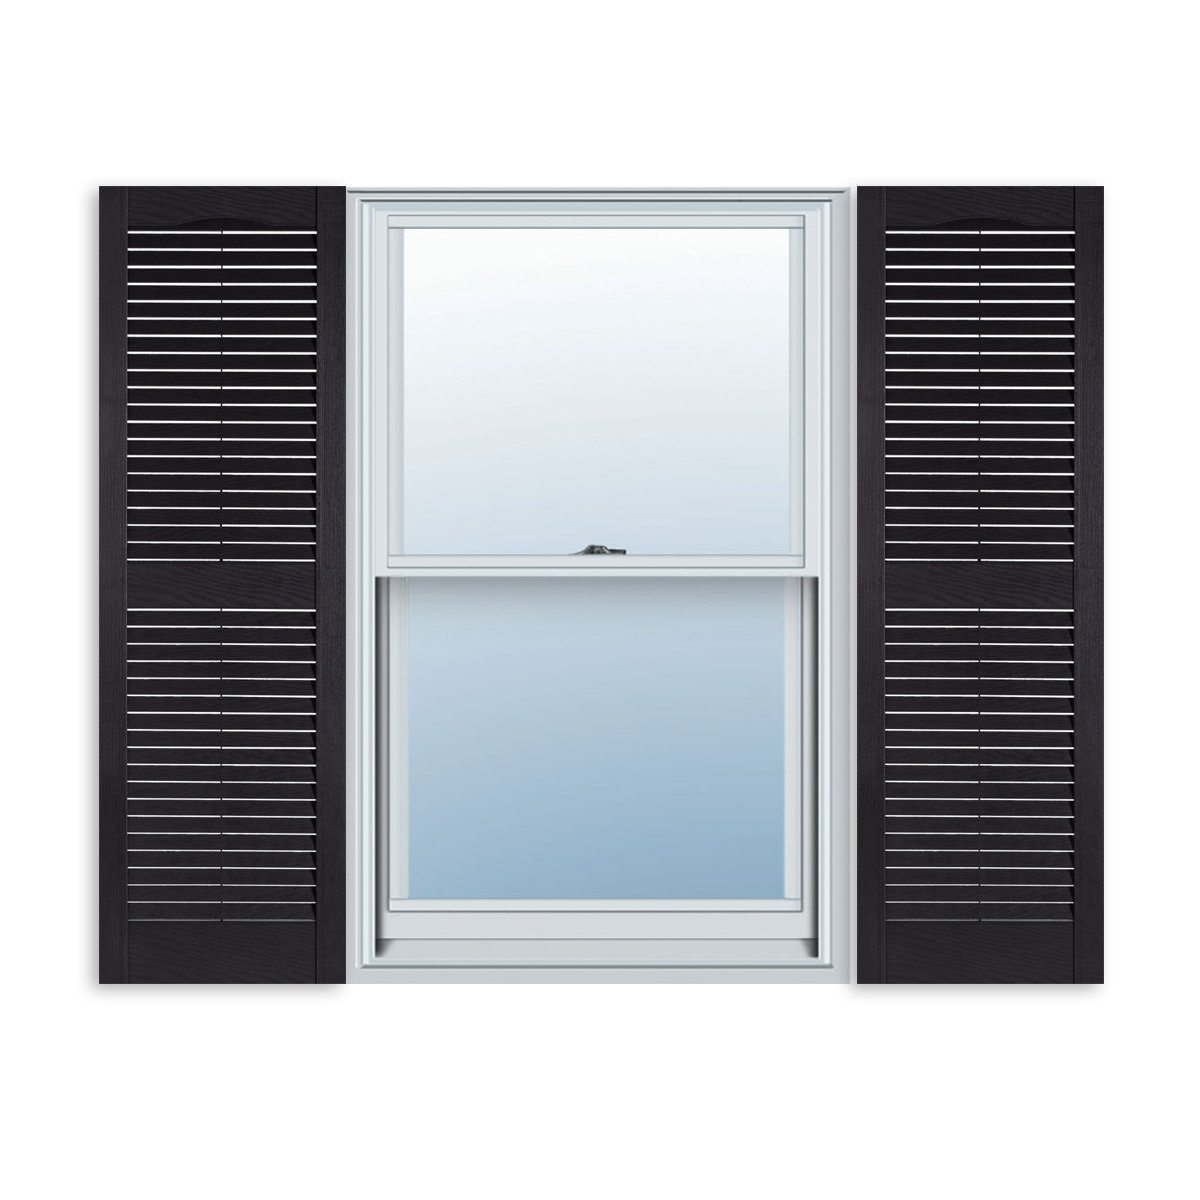 ExteriorSolutions.com Custom Exterior Vinyl Louver Window Shutters w/Installation Spikes (Pair)